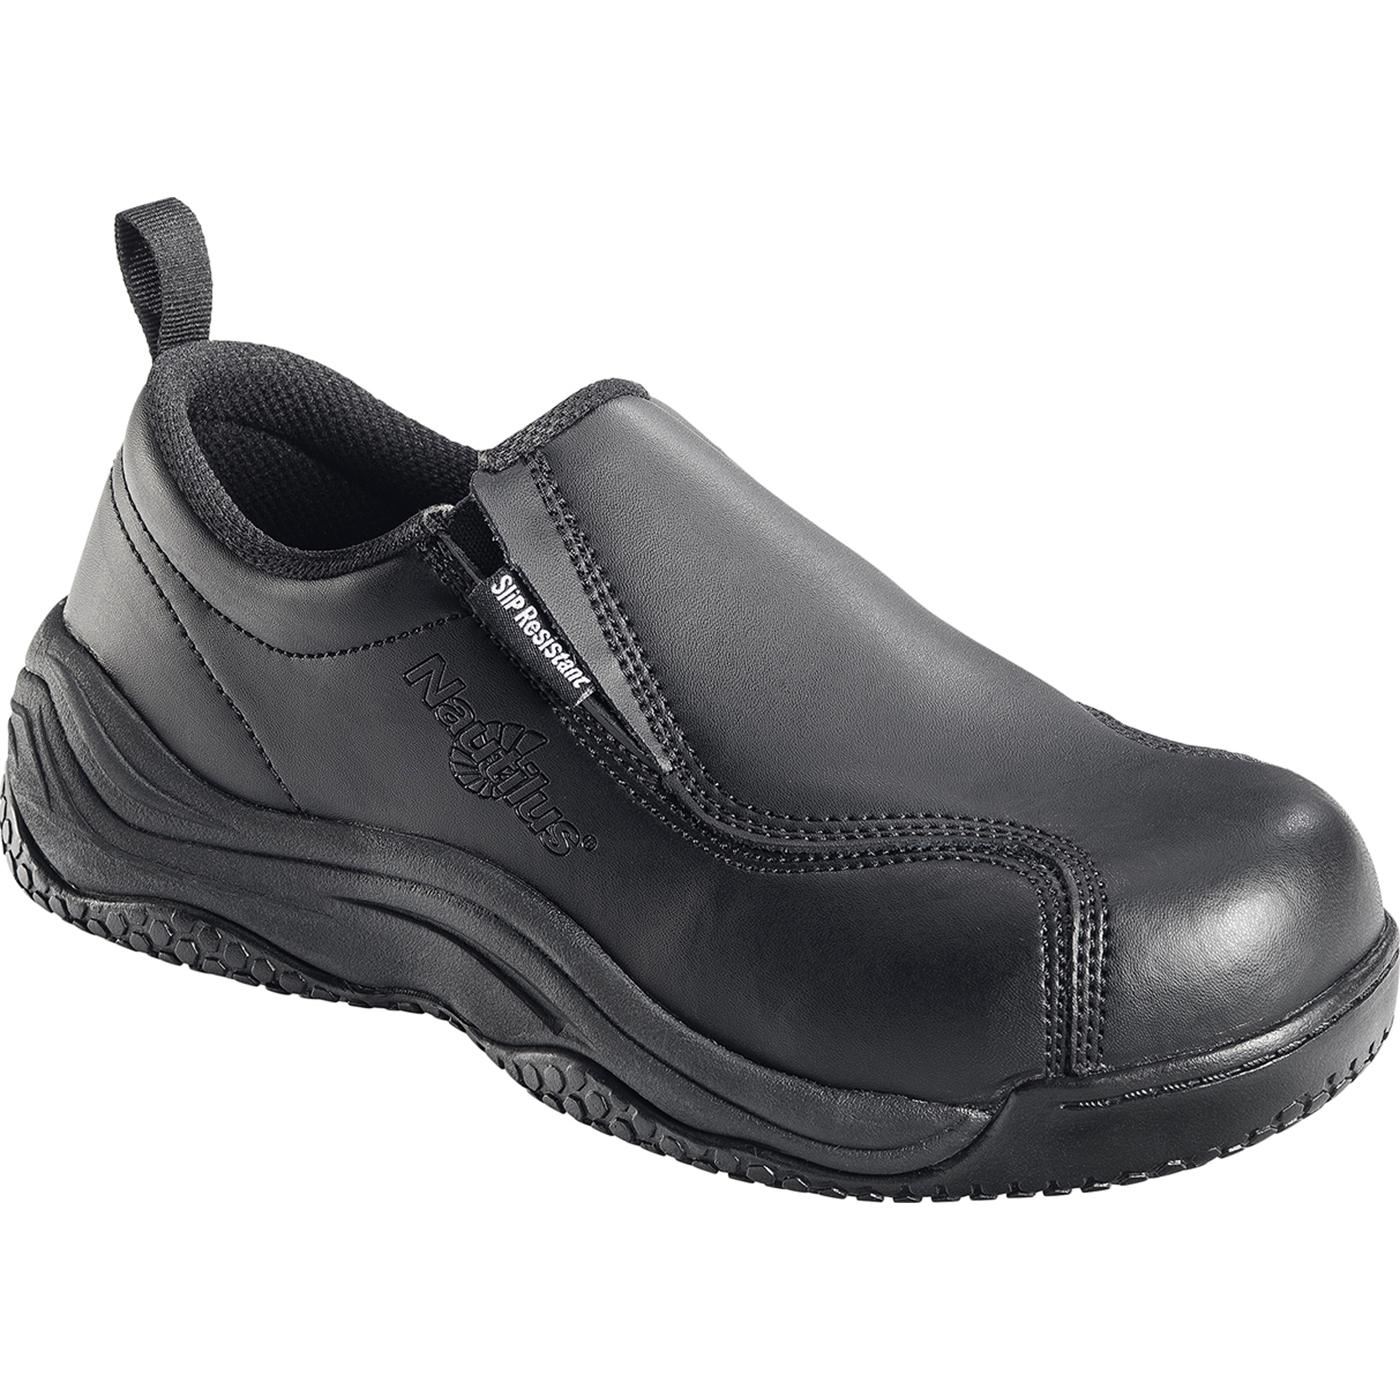 Durango Women S Shoe Boot Slip On